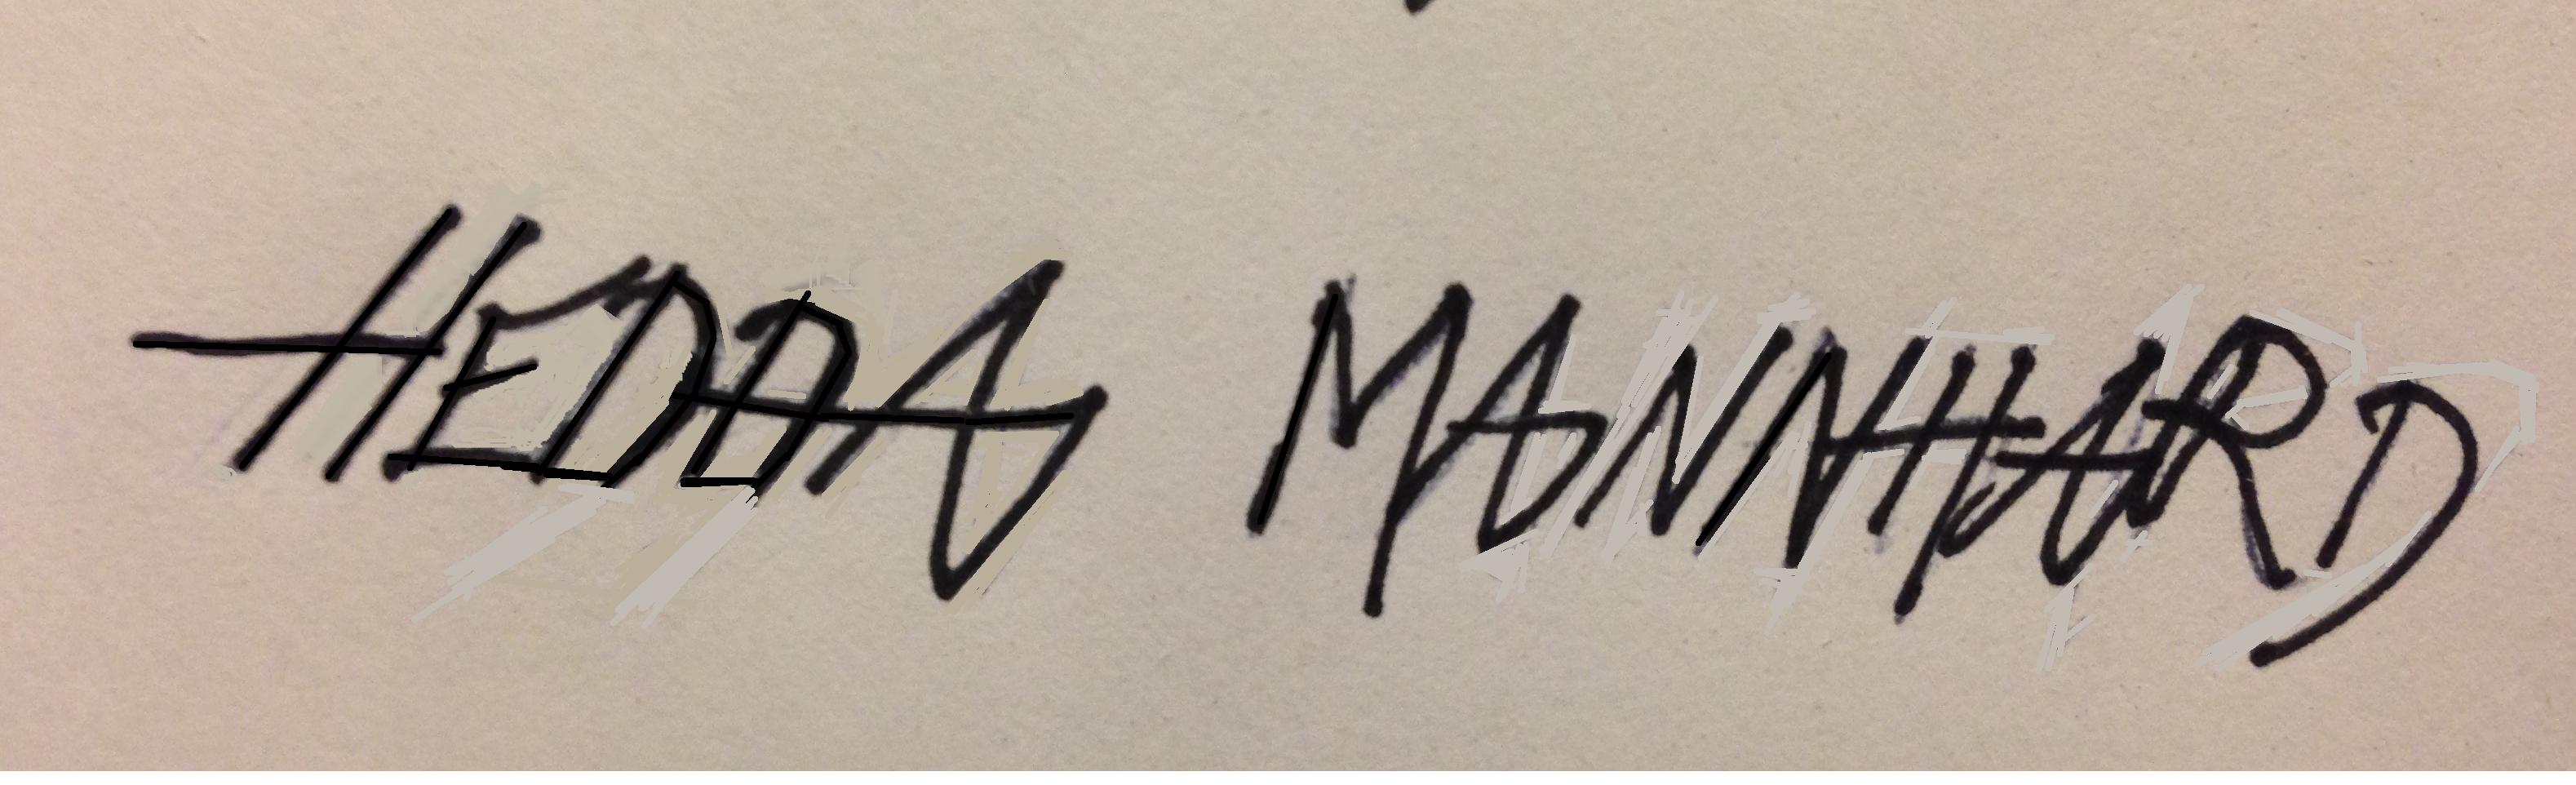 Hedda Mannhard Signature